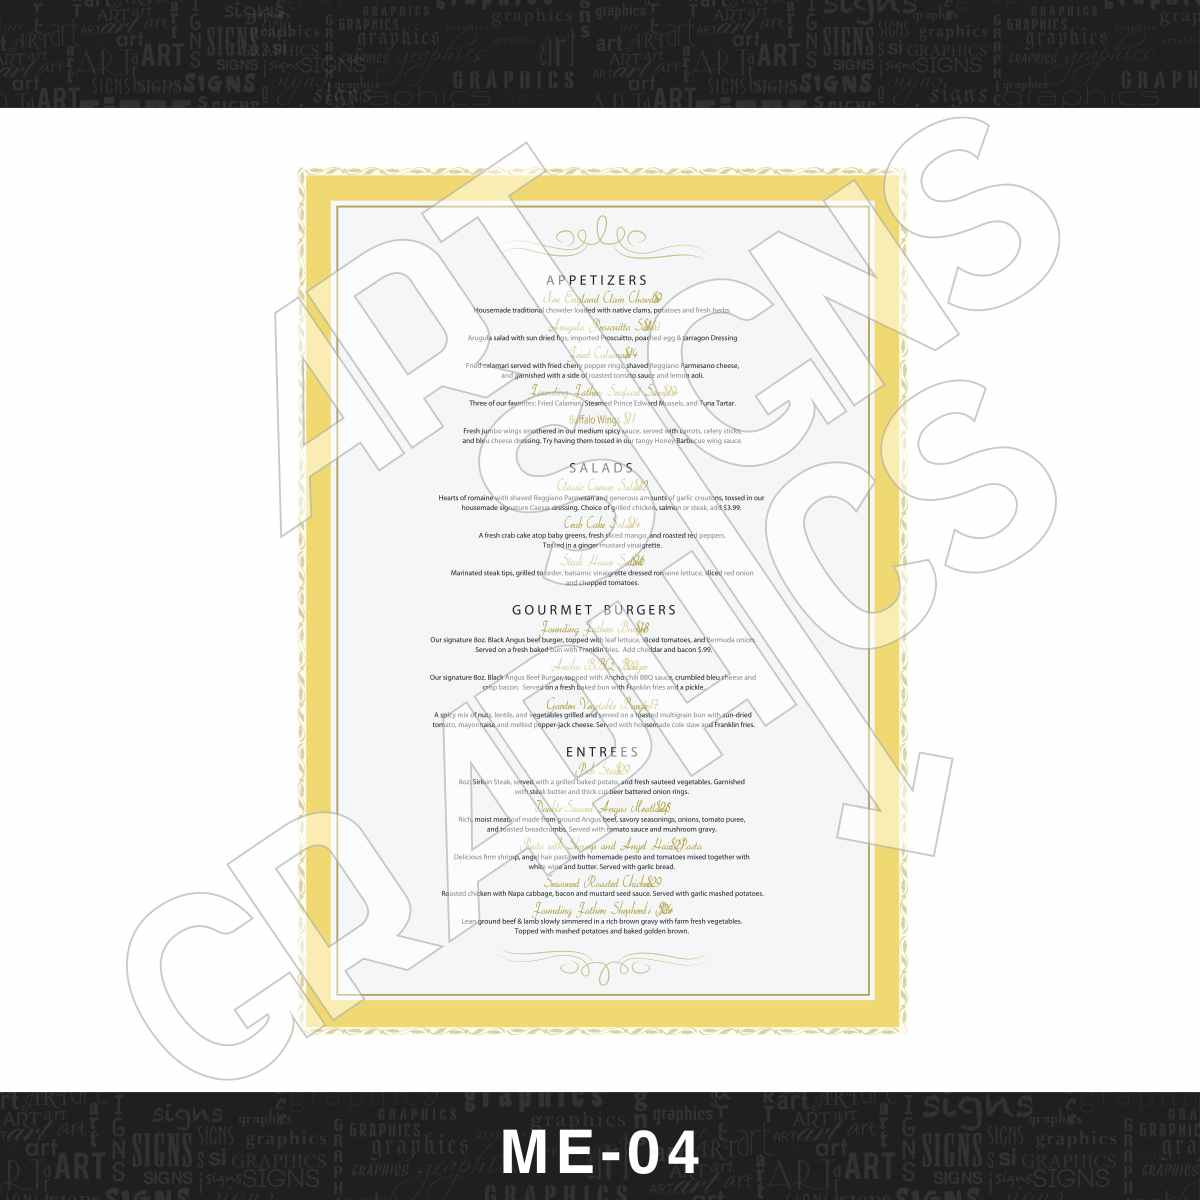 ME-04.jpg